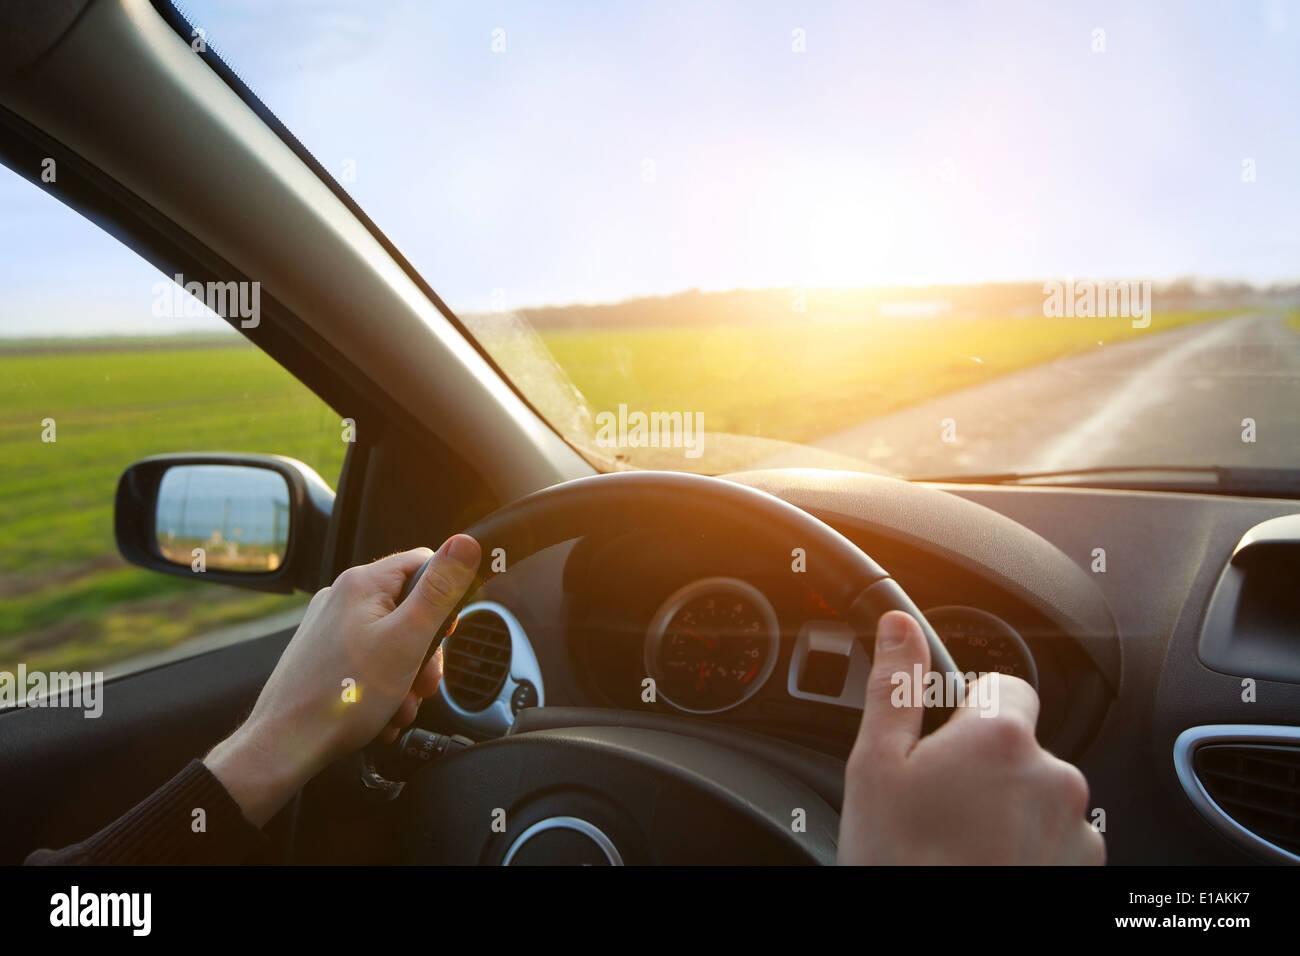 road trip - Stock Image